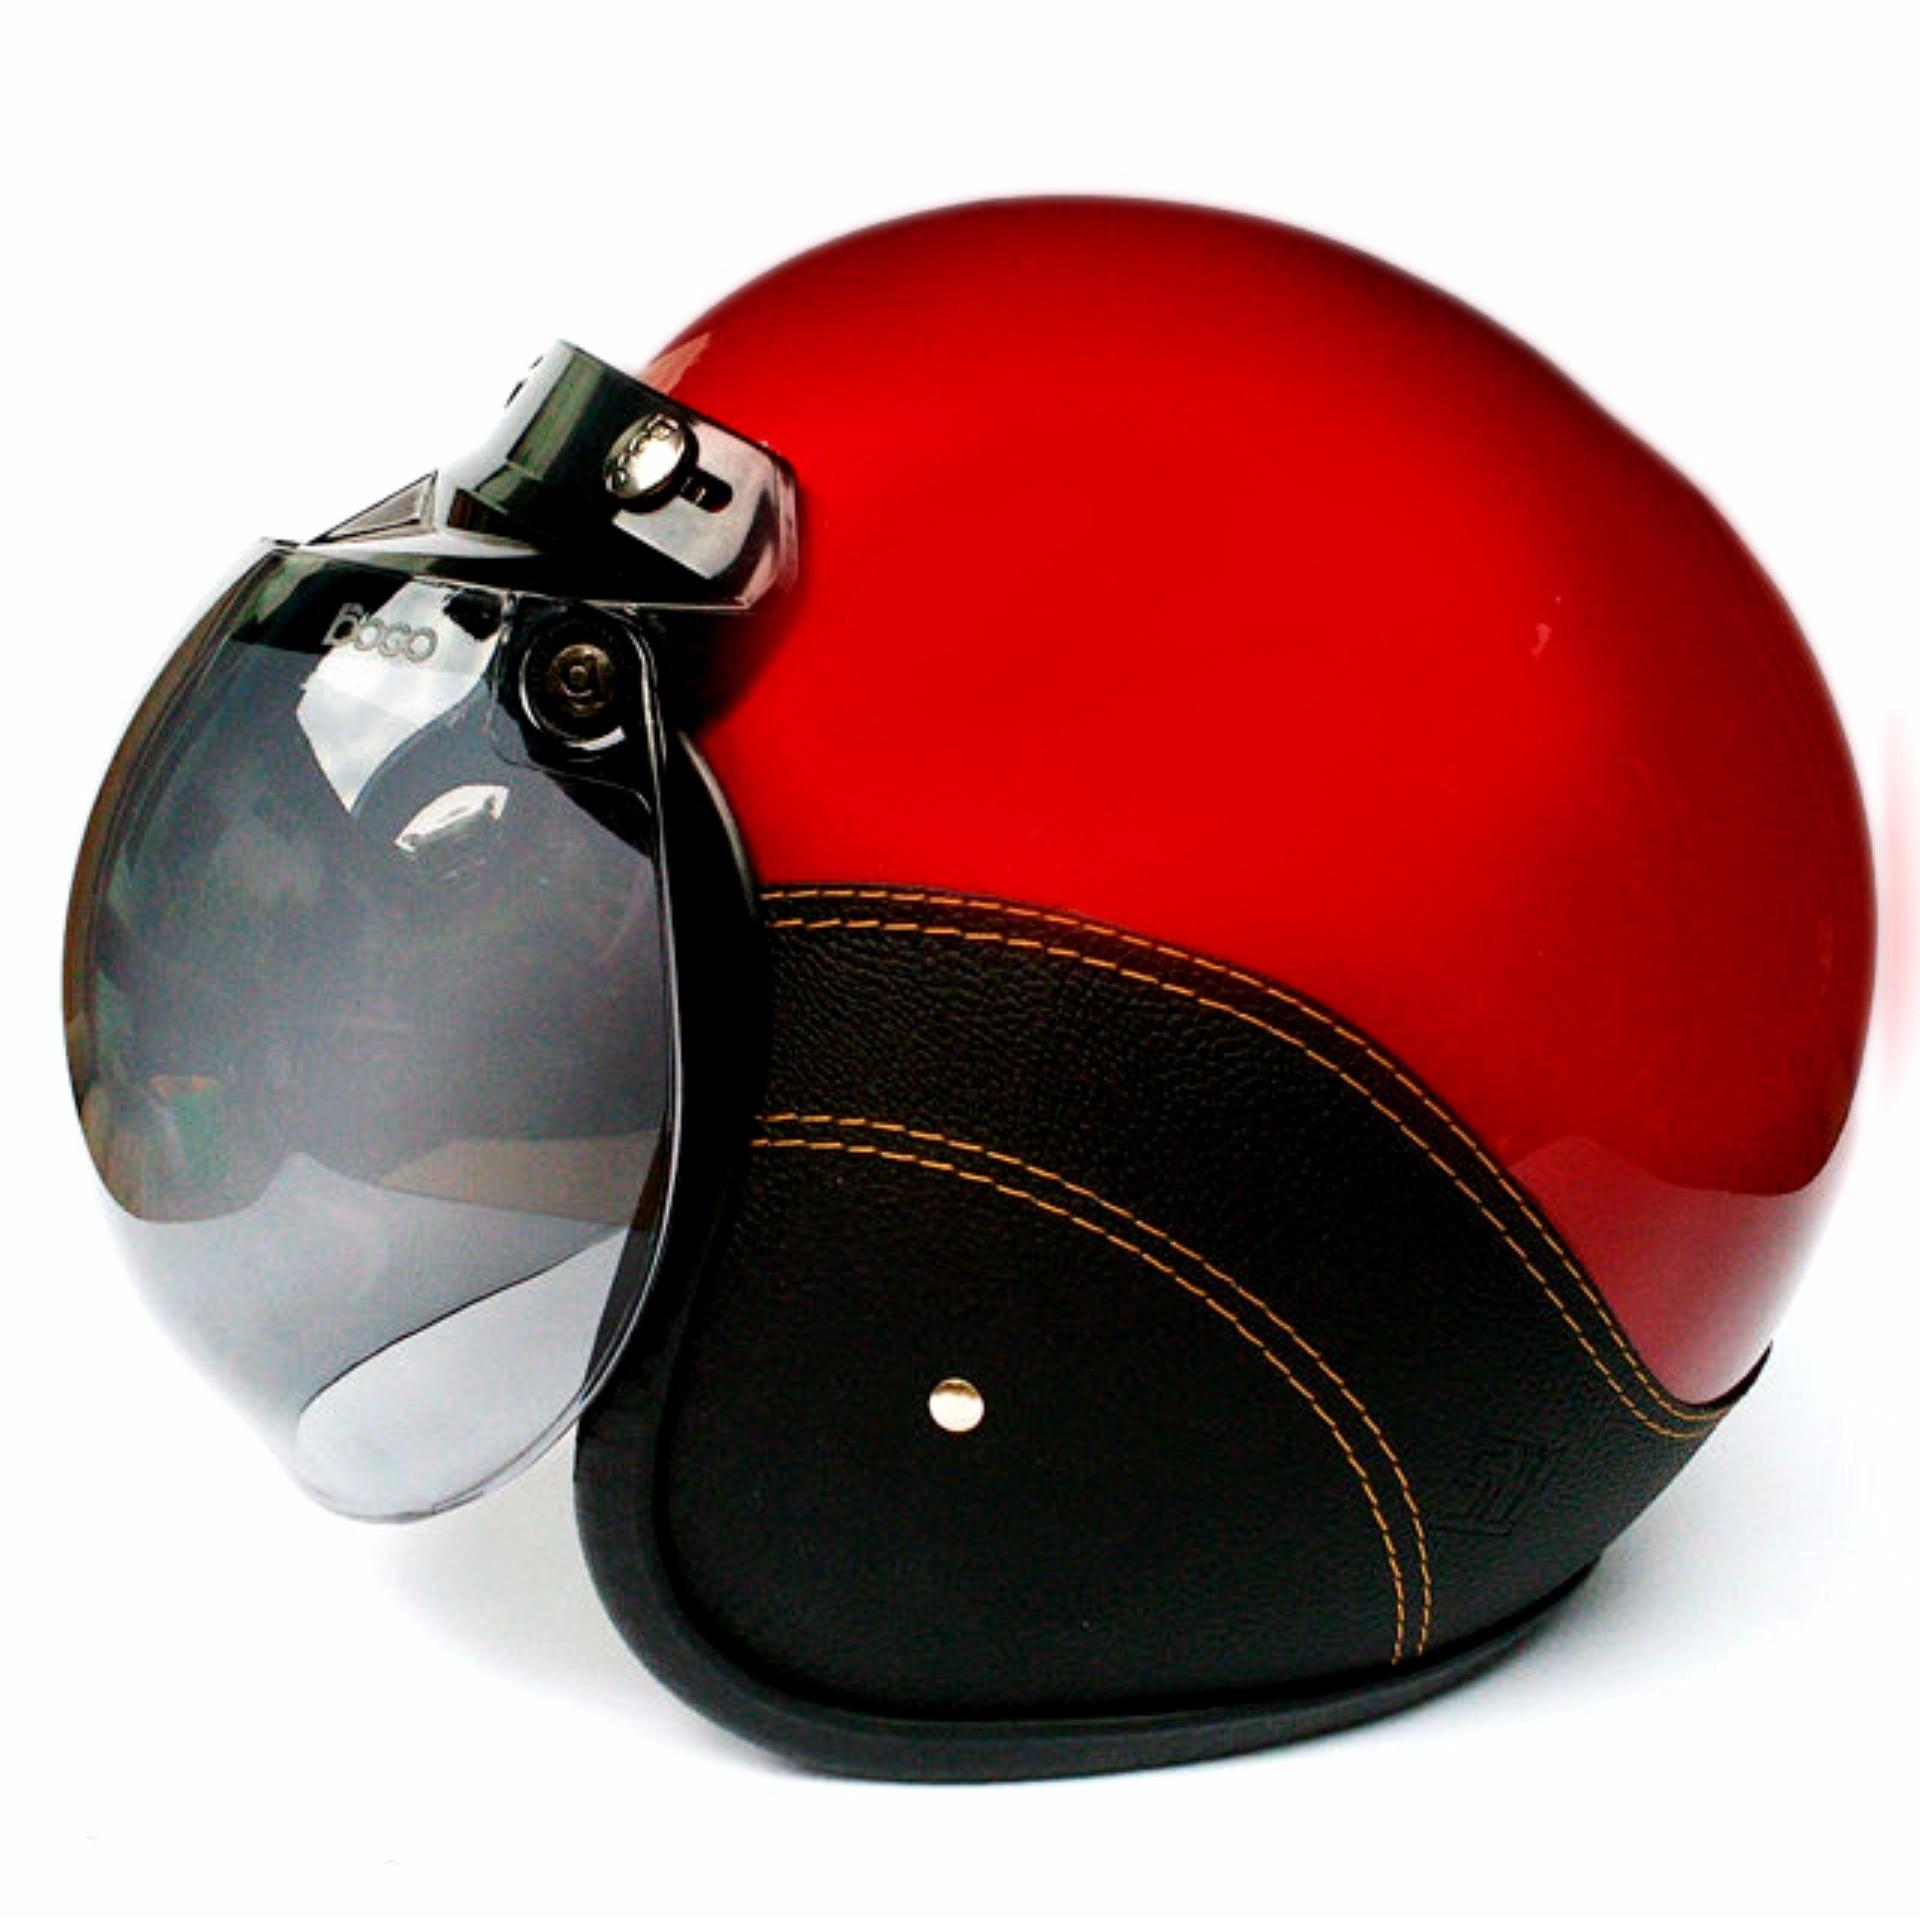 Spesifikasi Jbx Helm Retro Kaca Bogo Style Klasik Jbx Helmets